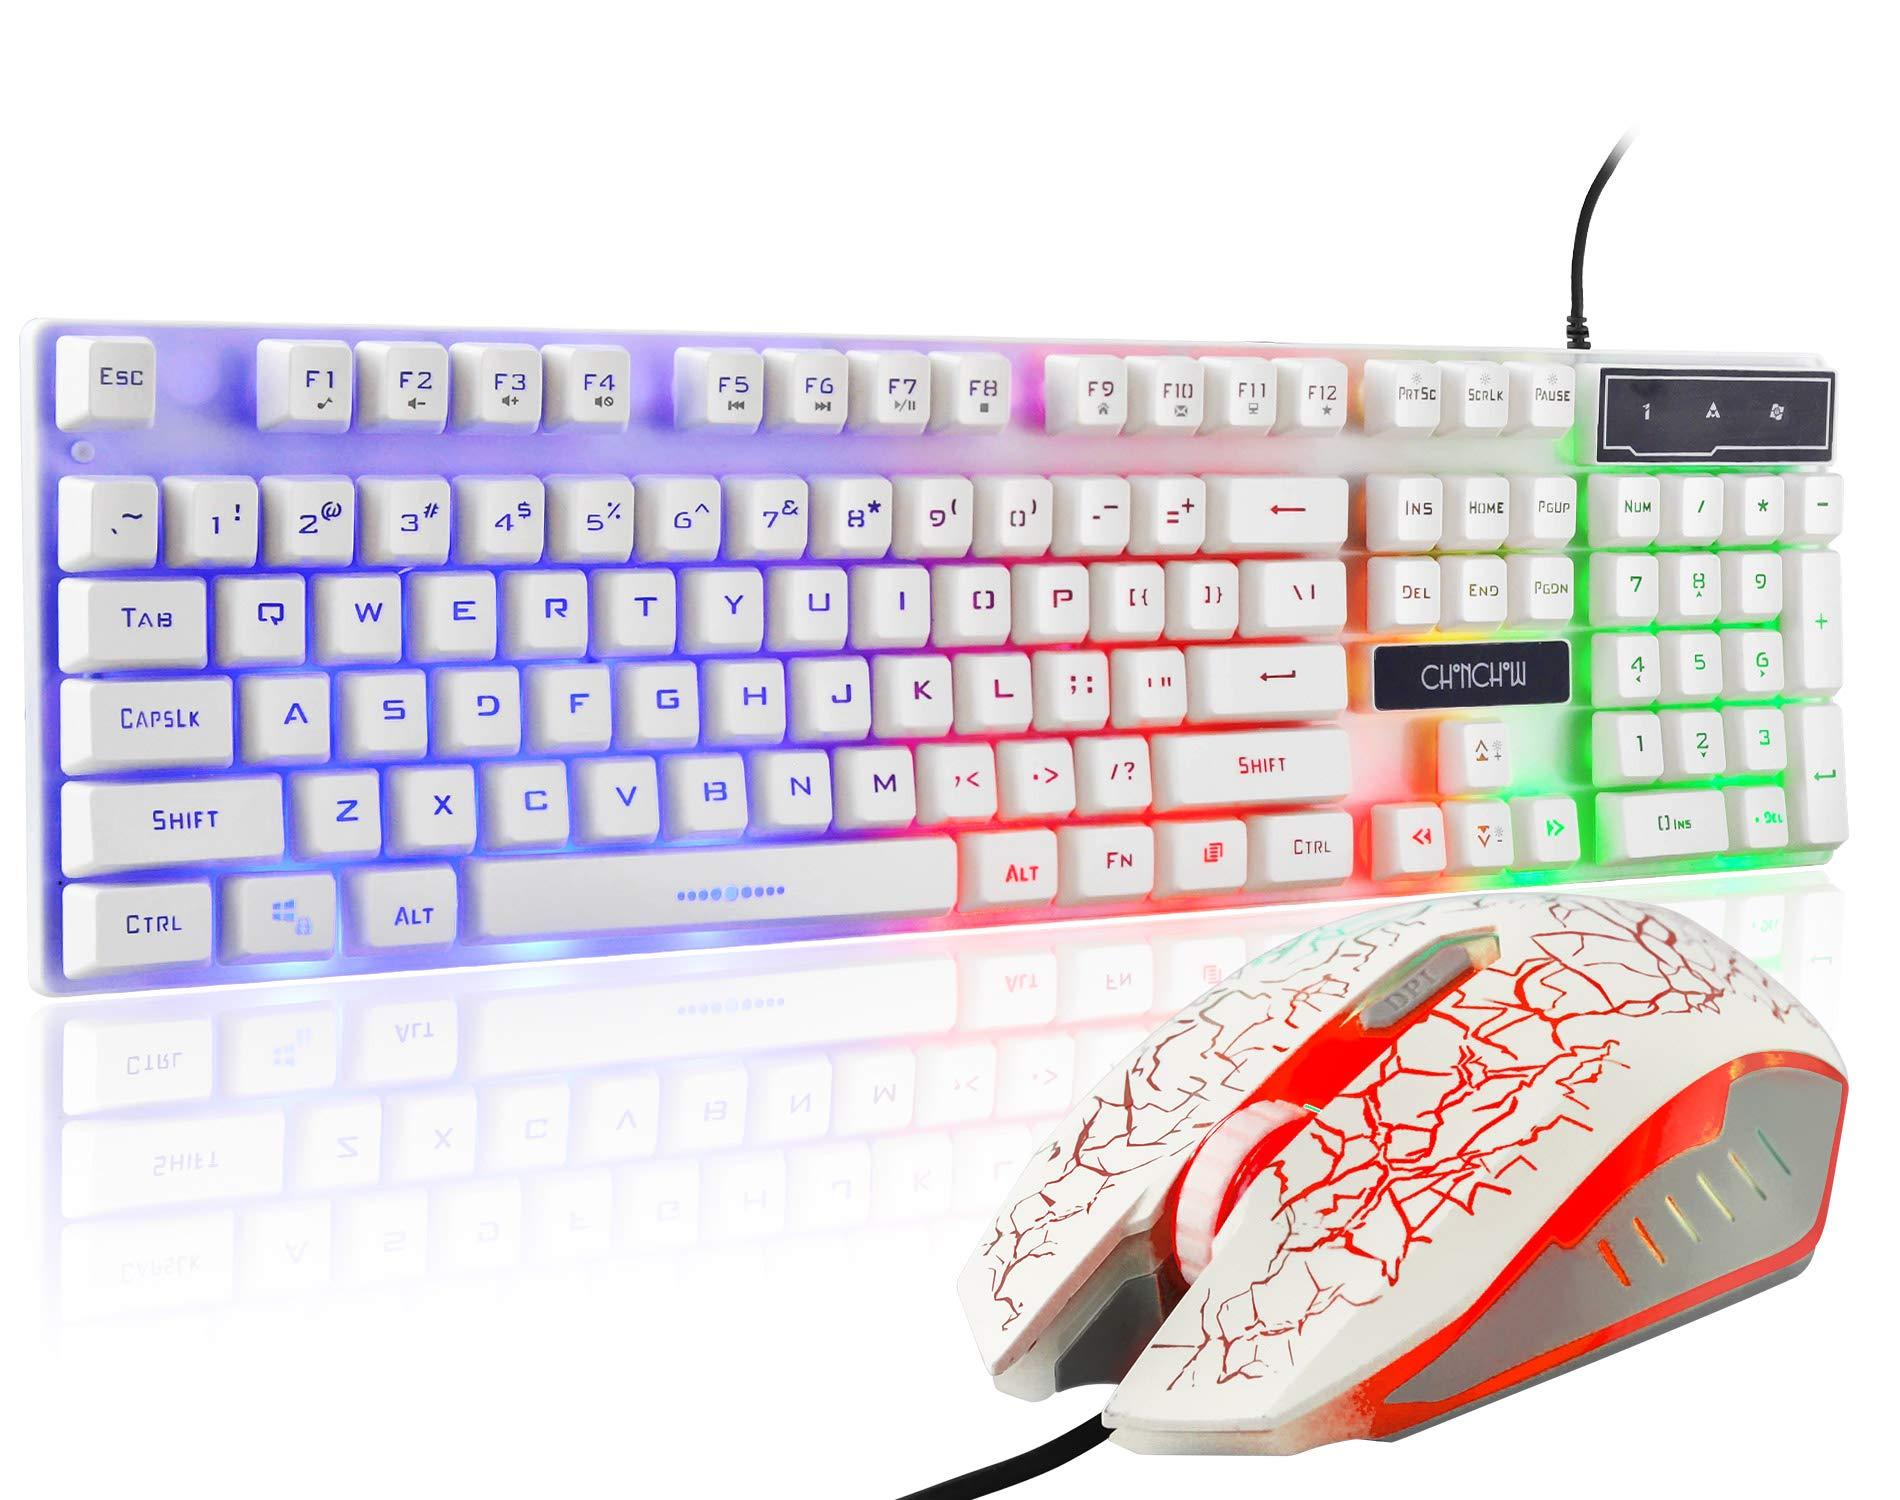 Gaming LED Backlit Keyboard and Mouse Combo with Emitting Character 3 Adjustable LED Backlight 3200DPI USB Mouse Multimedia Keys Mechanical Feeling for PC Resberry Pi Mac TOB Box (White)